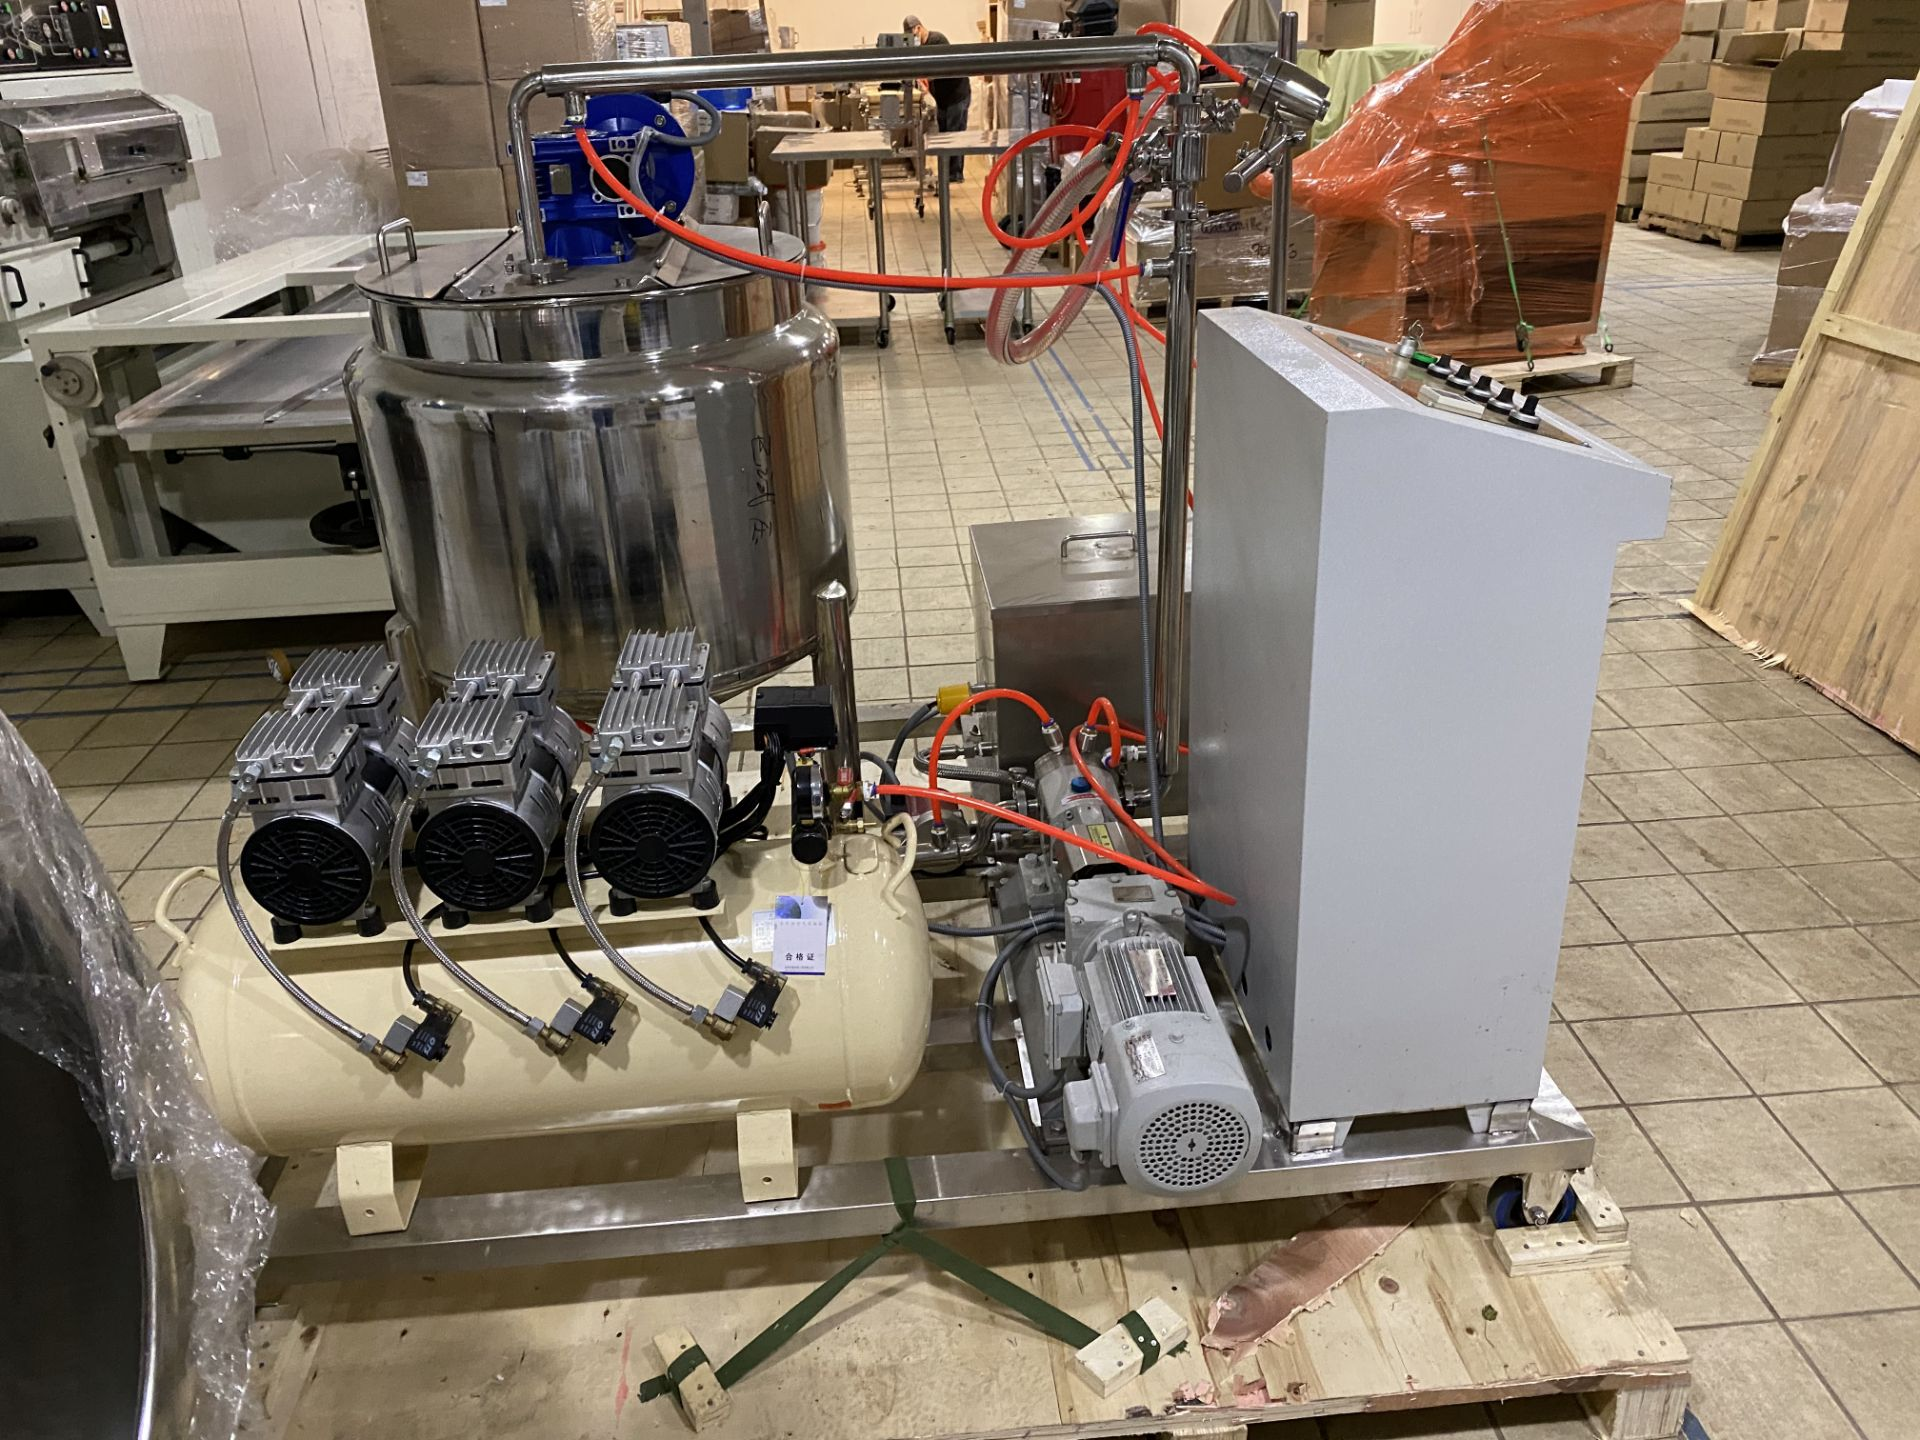 Lot 105 - Coating Spray System